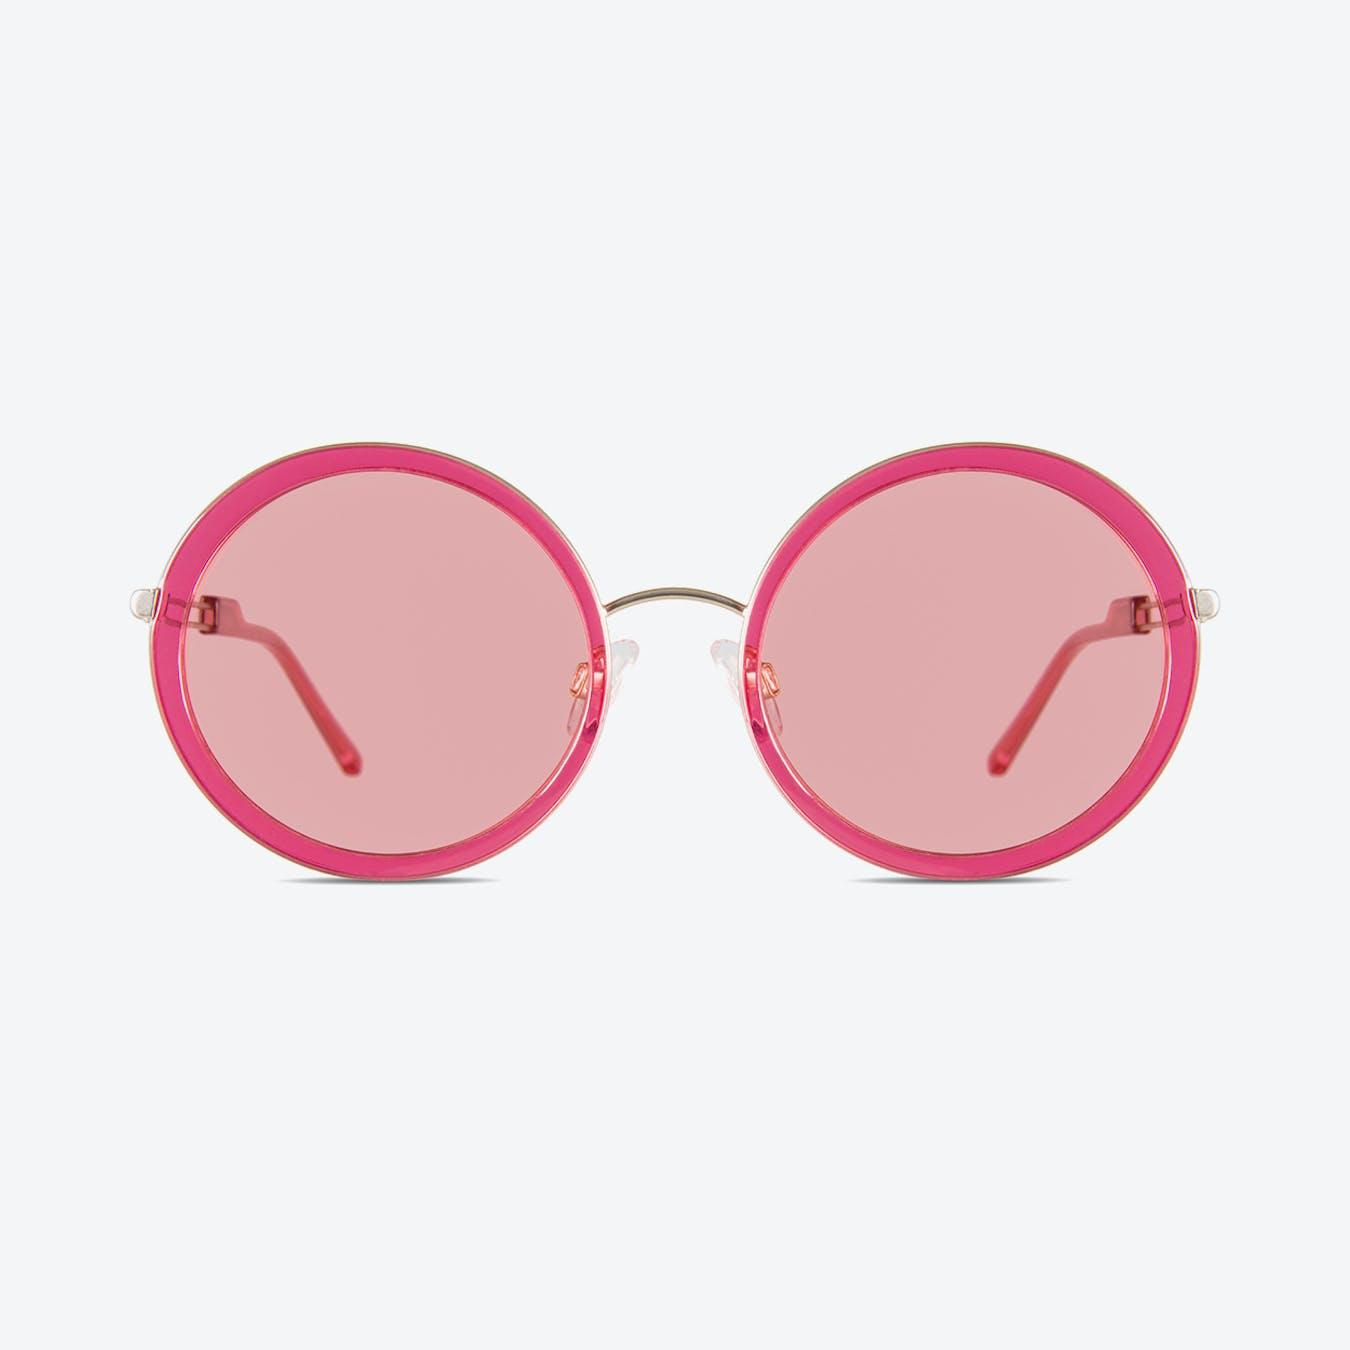 Miss Joplin and Some Sunglasses